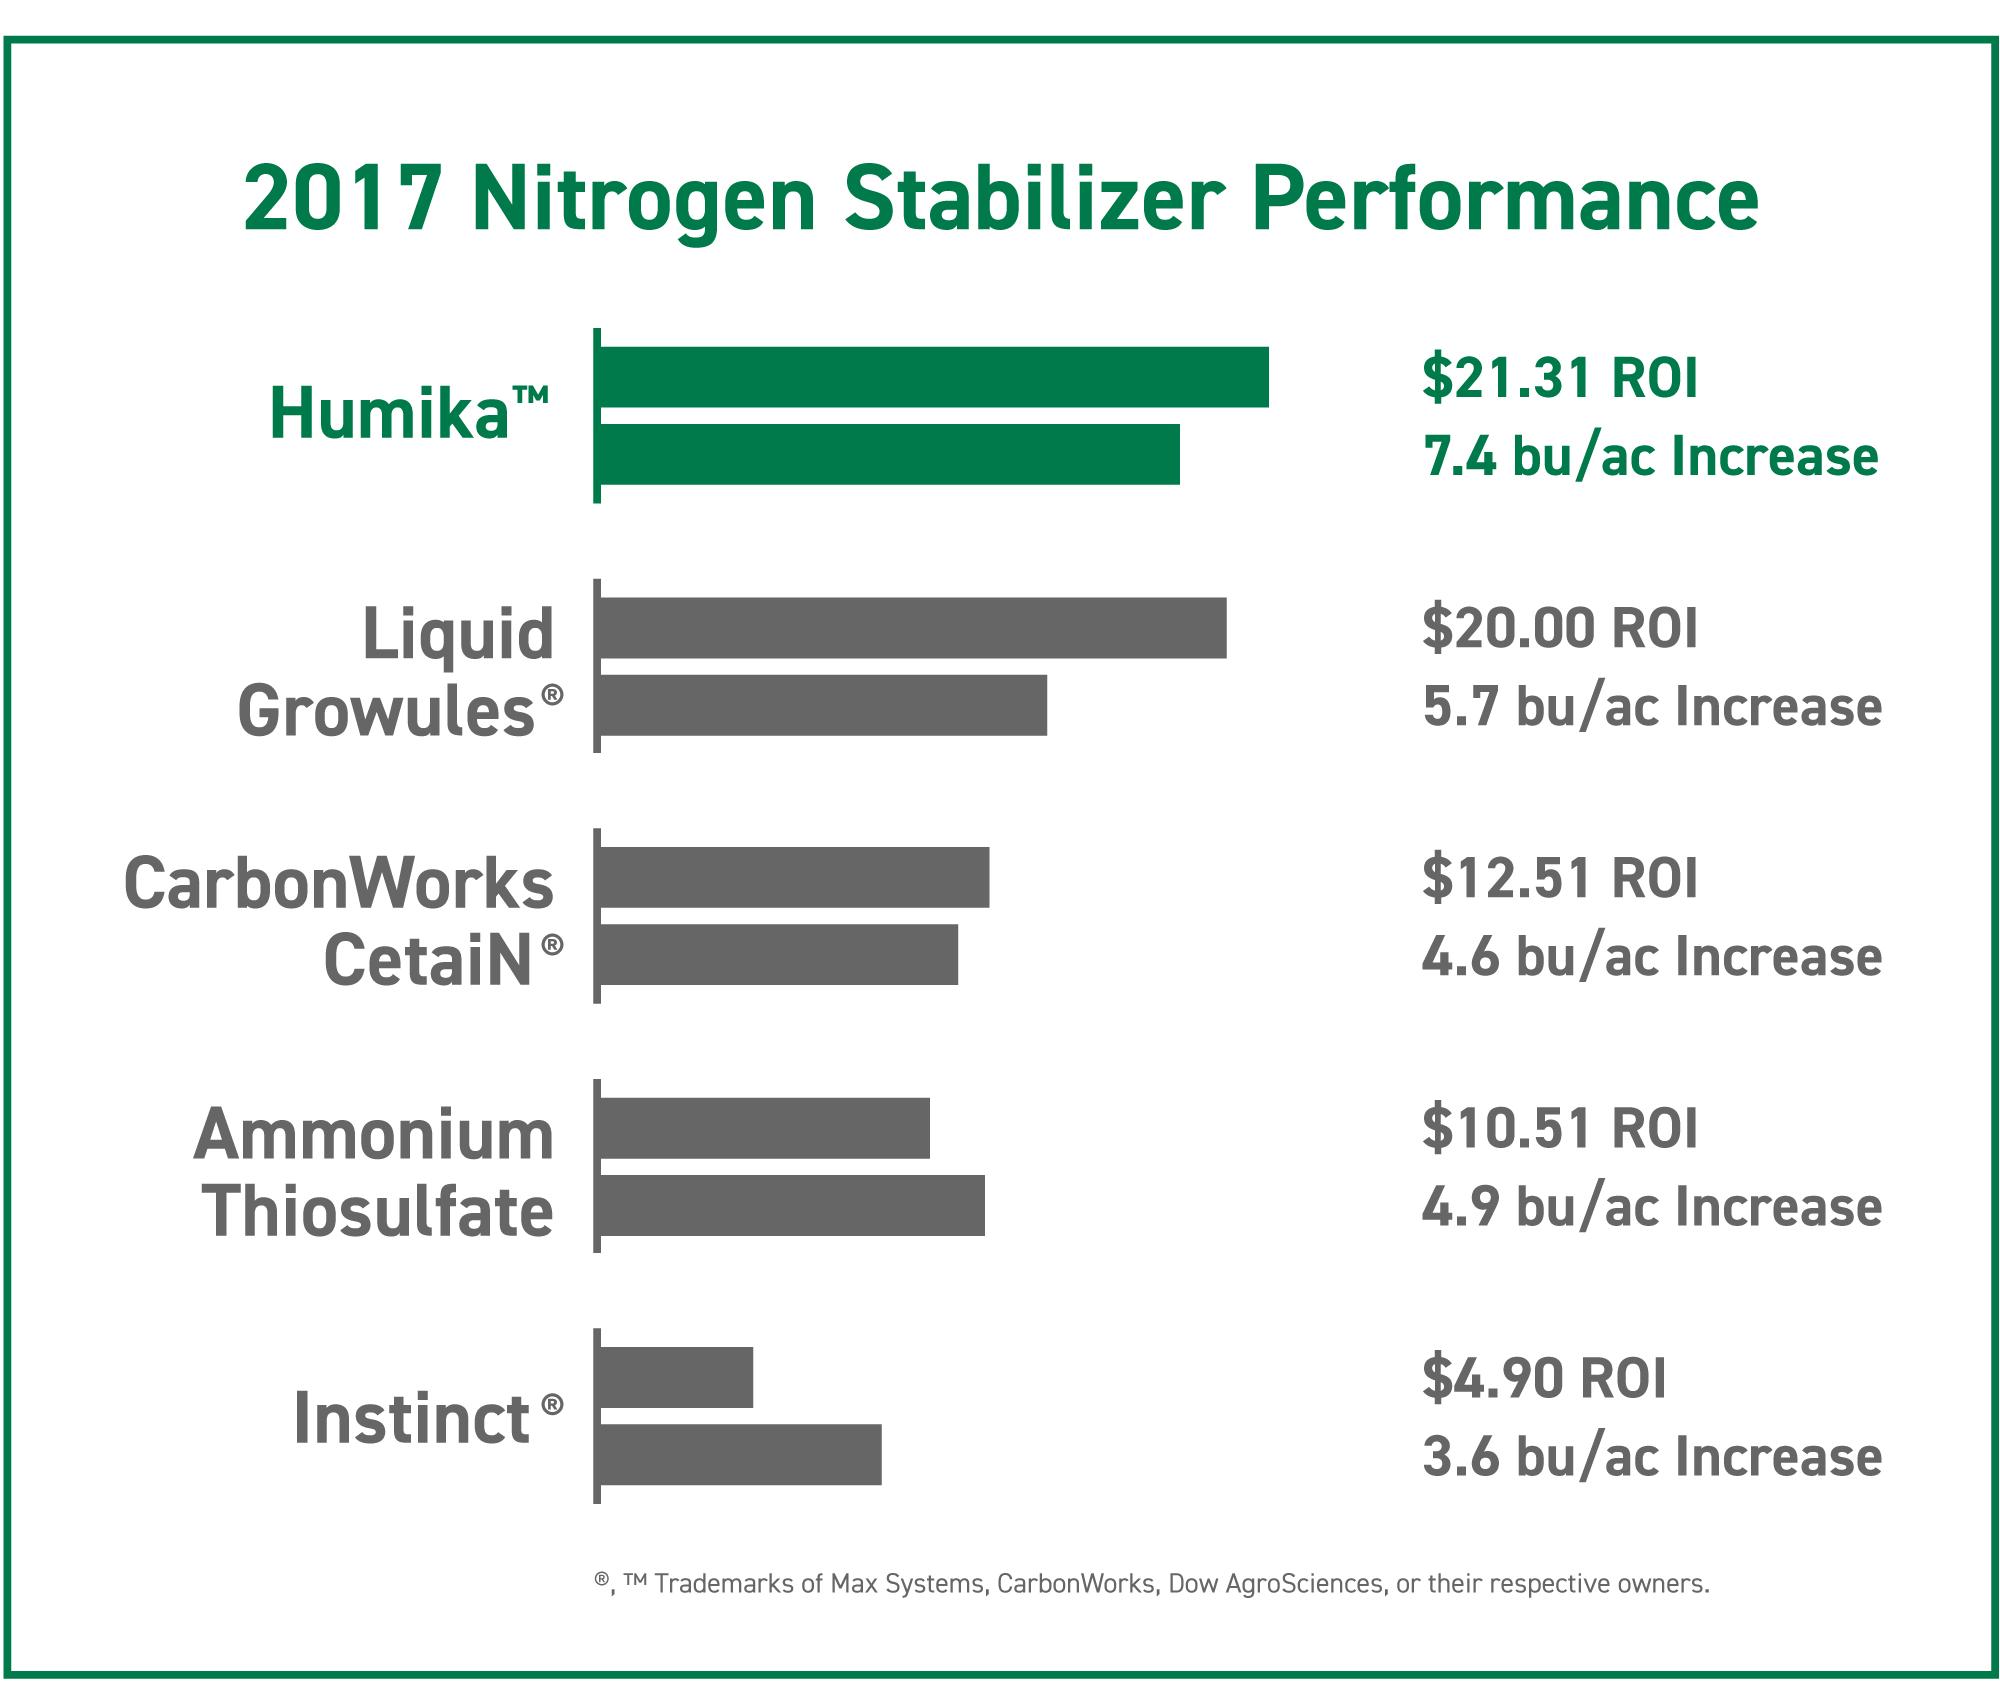 2017 nitrogen stabilizer corn trial results